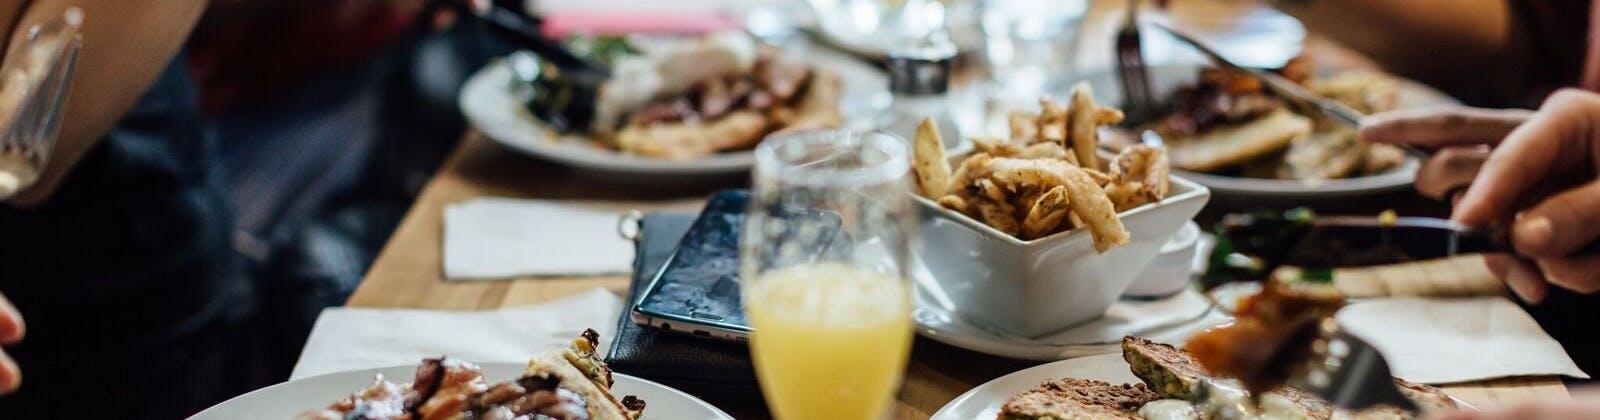 Howick restaurant Basalt does an annual bottomless Christmas brunch